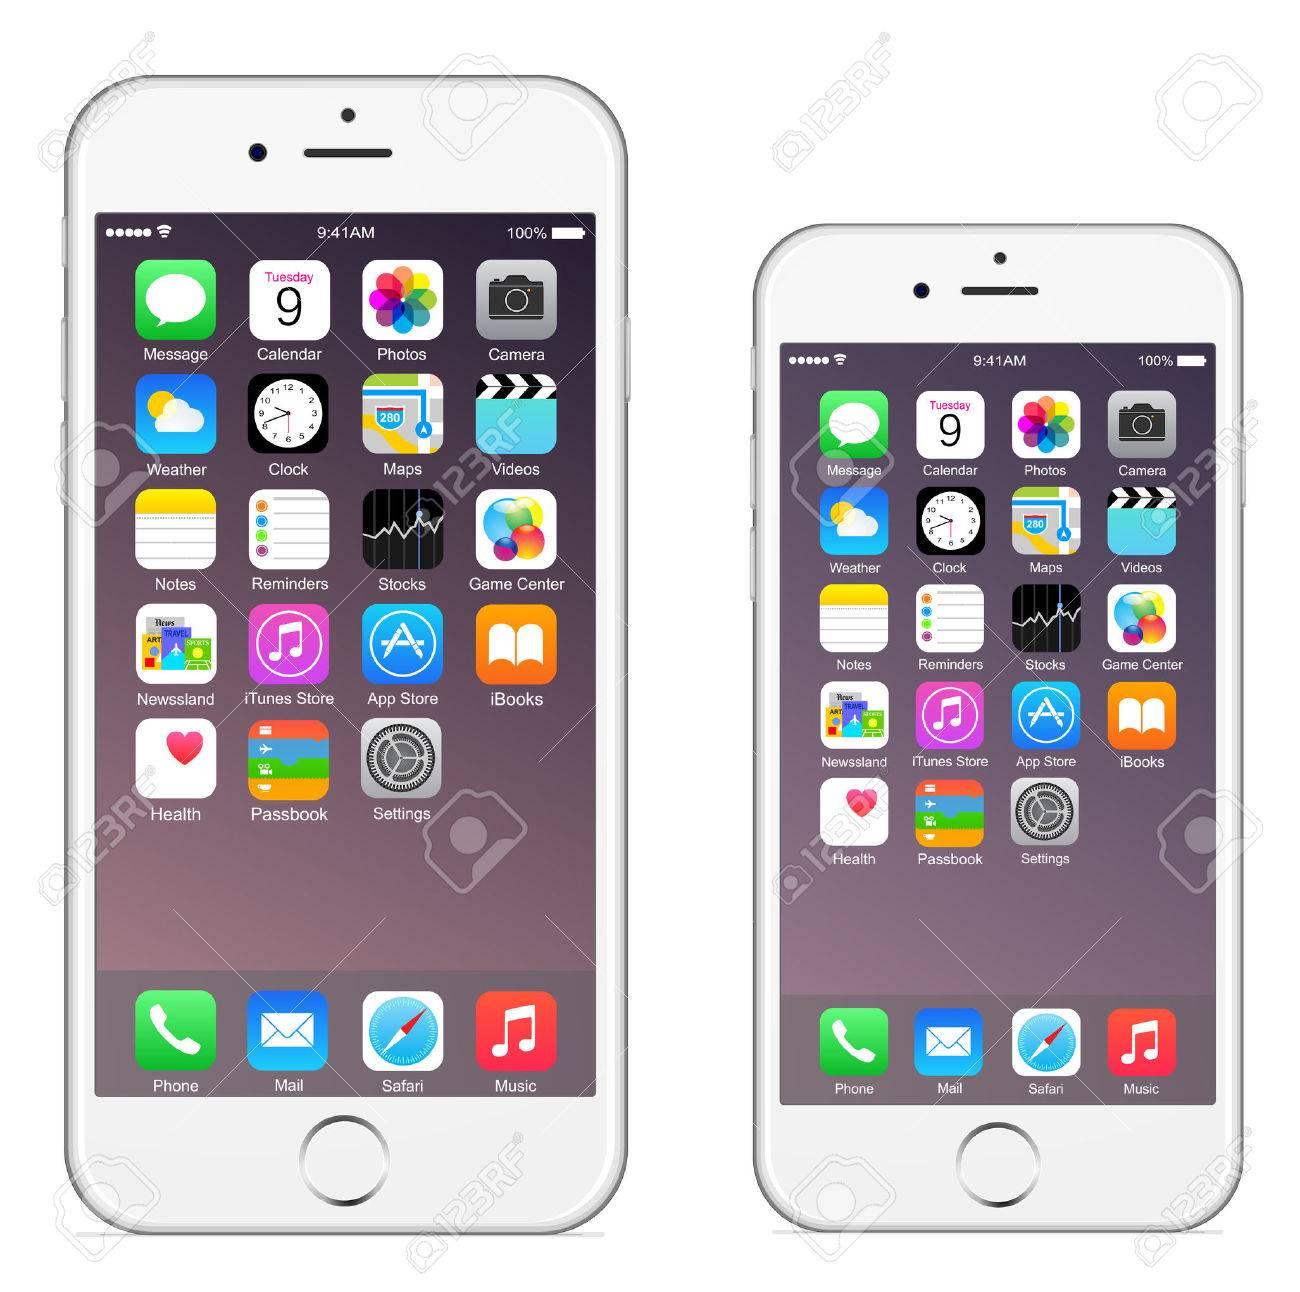 6 Iphone Iphone 6 plus Banque d'images - 31609862